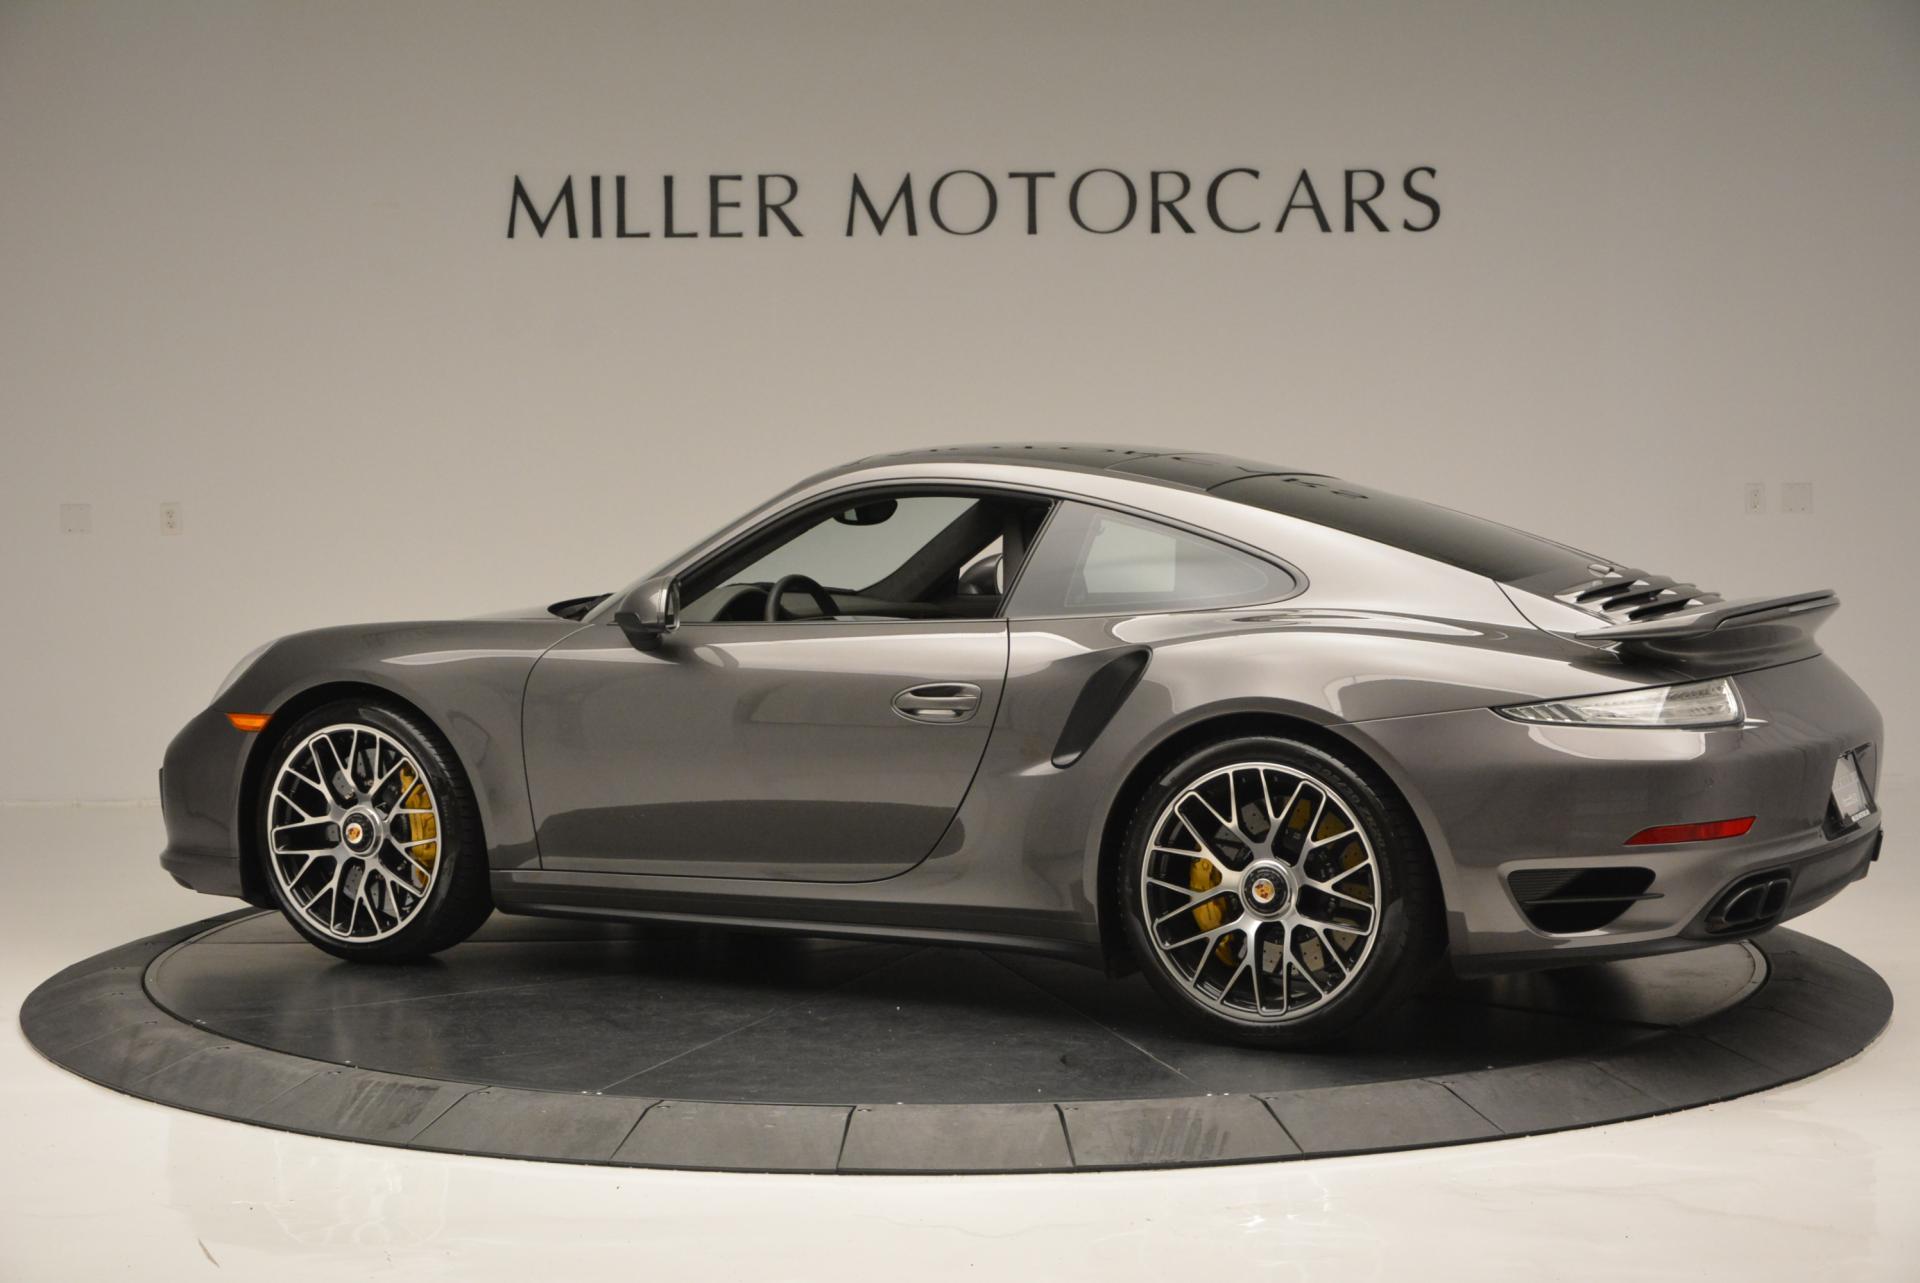 Used 2014 Porsche 911 Turbo S For Sale In Greenwich, CT 113_p4